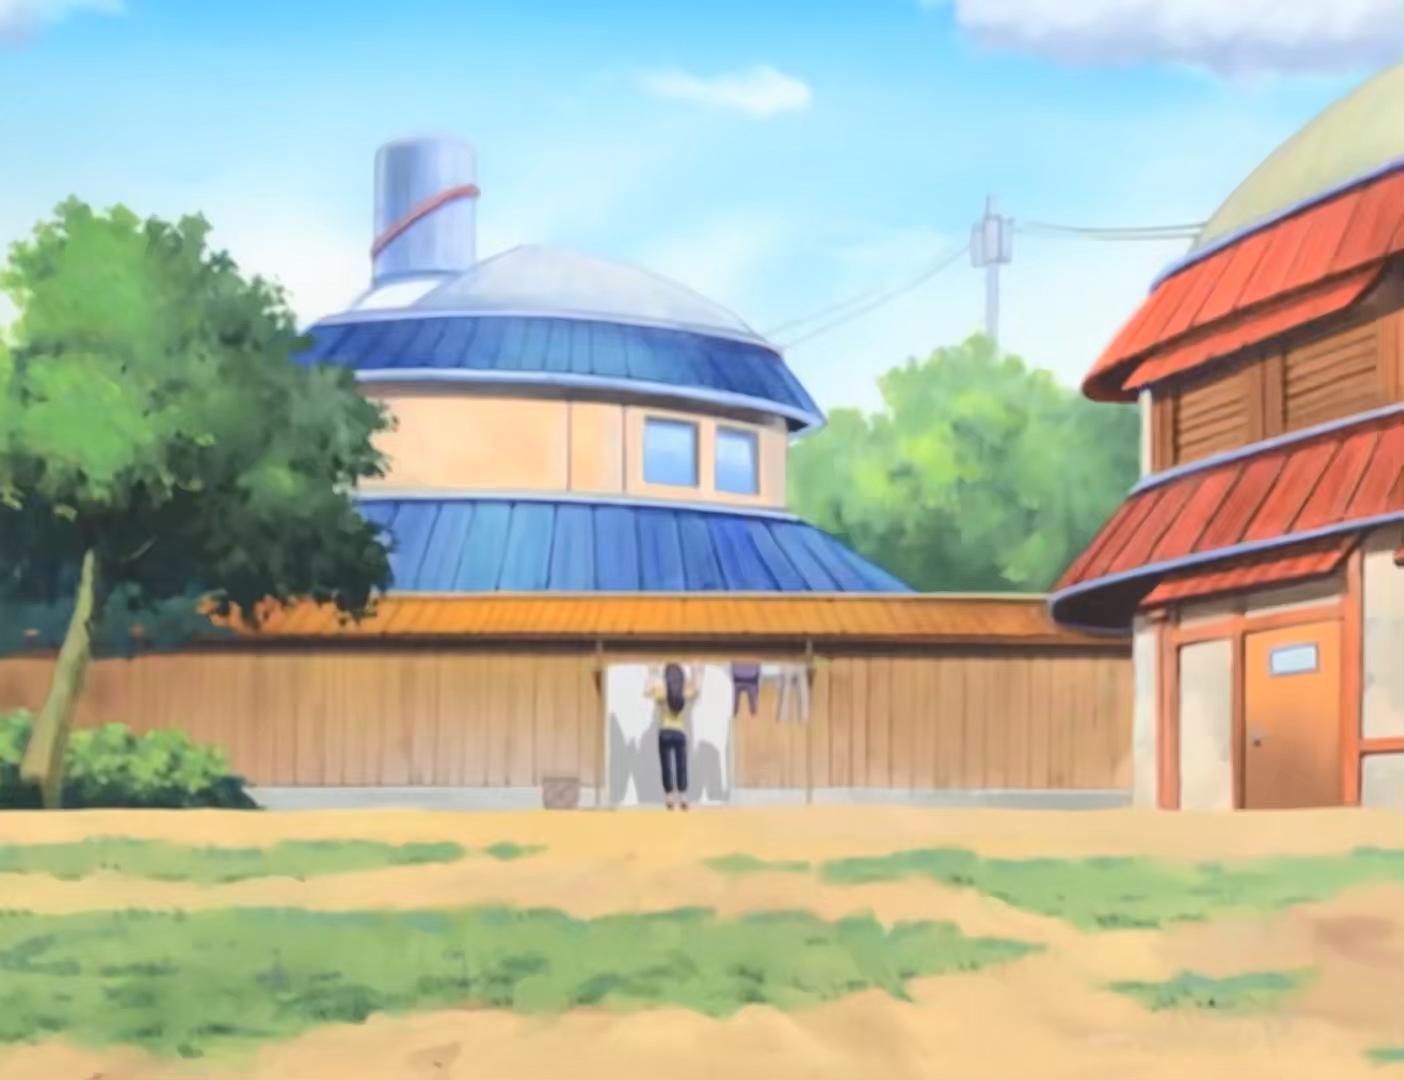 Кадр из аниме Наруто [ТВ-2]